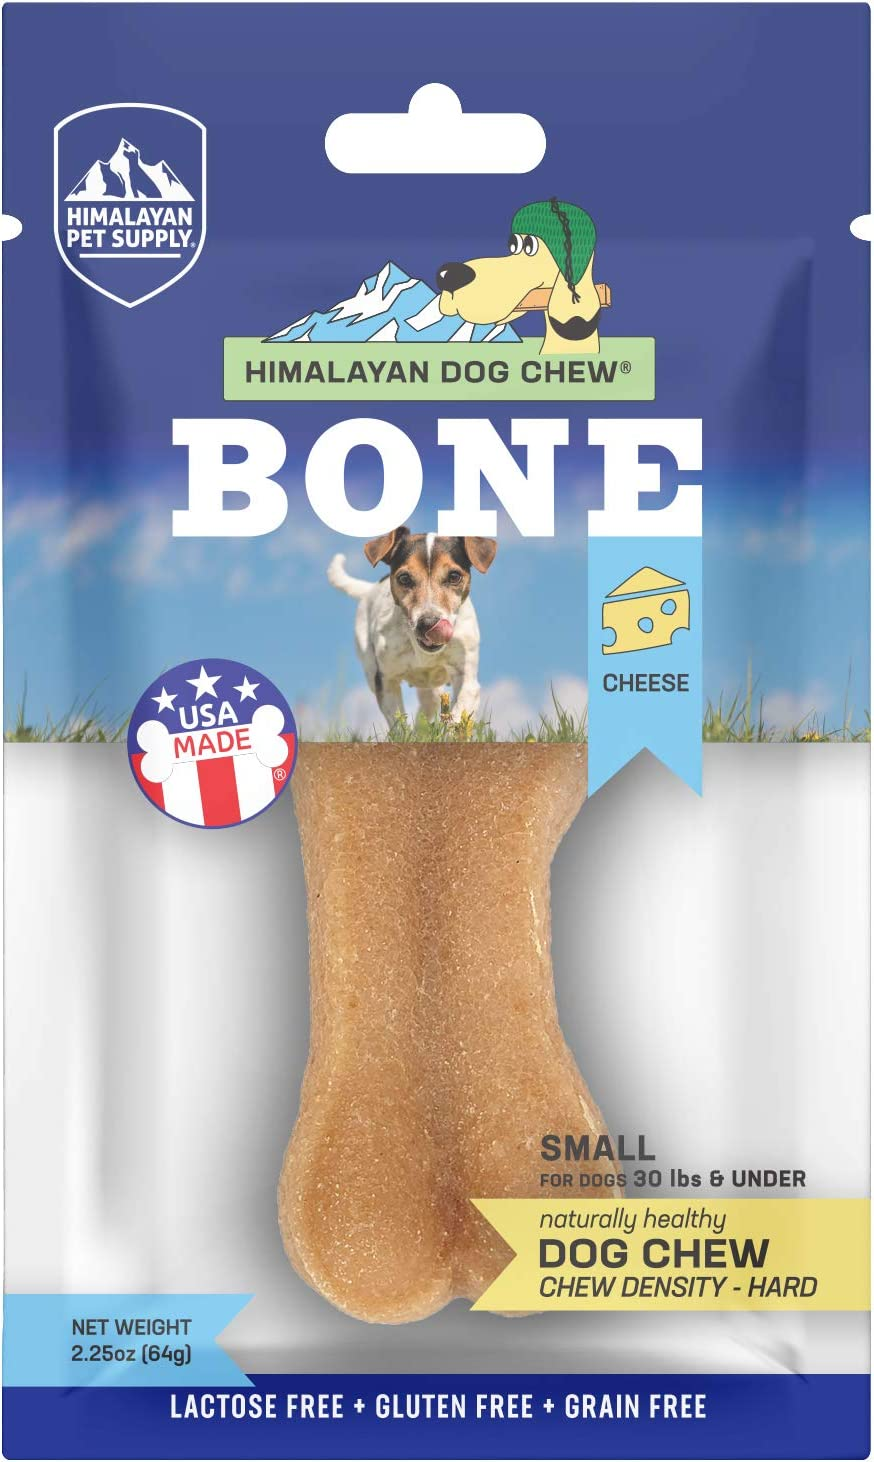 Himalayan Japan Maker New Pet Supply Bone Cheese Ranking TOP15 Hard Shaped Chew